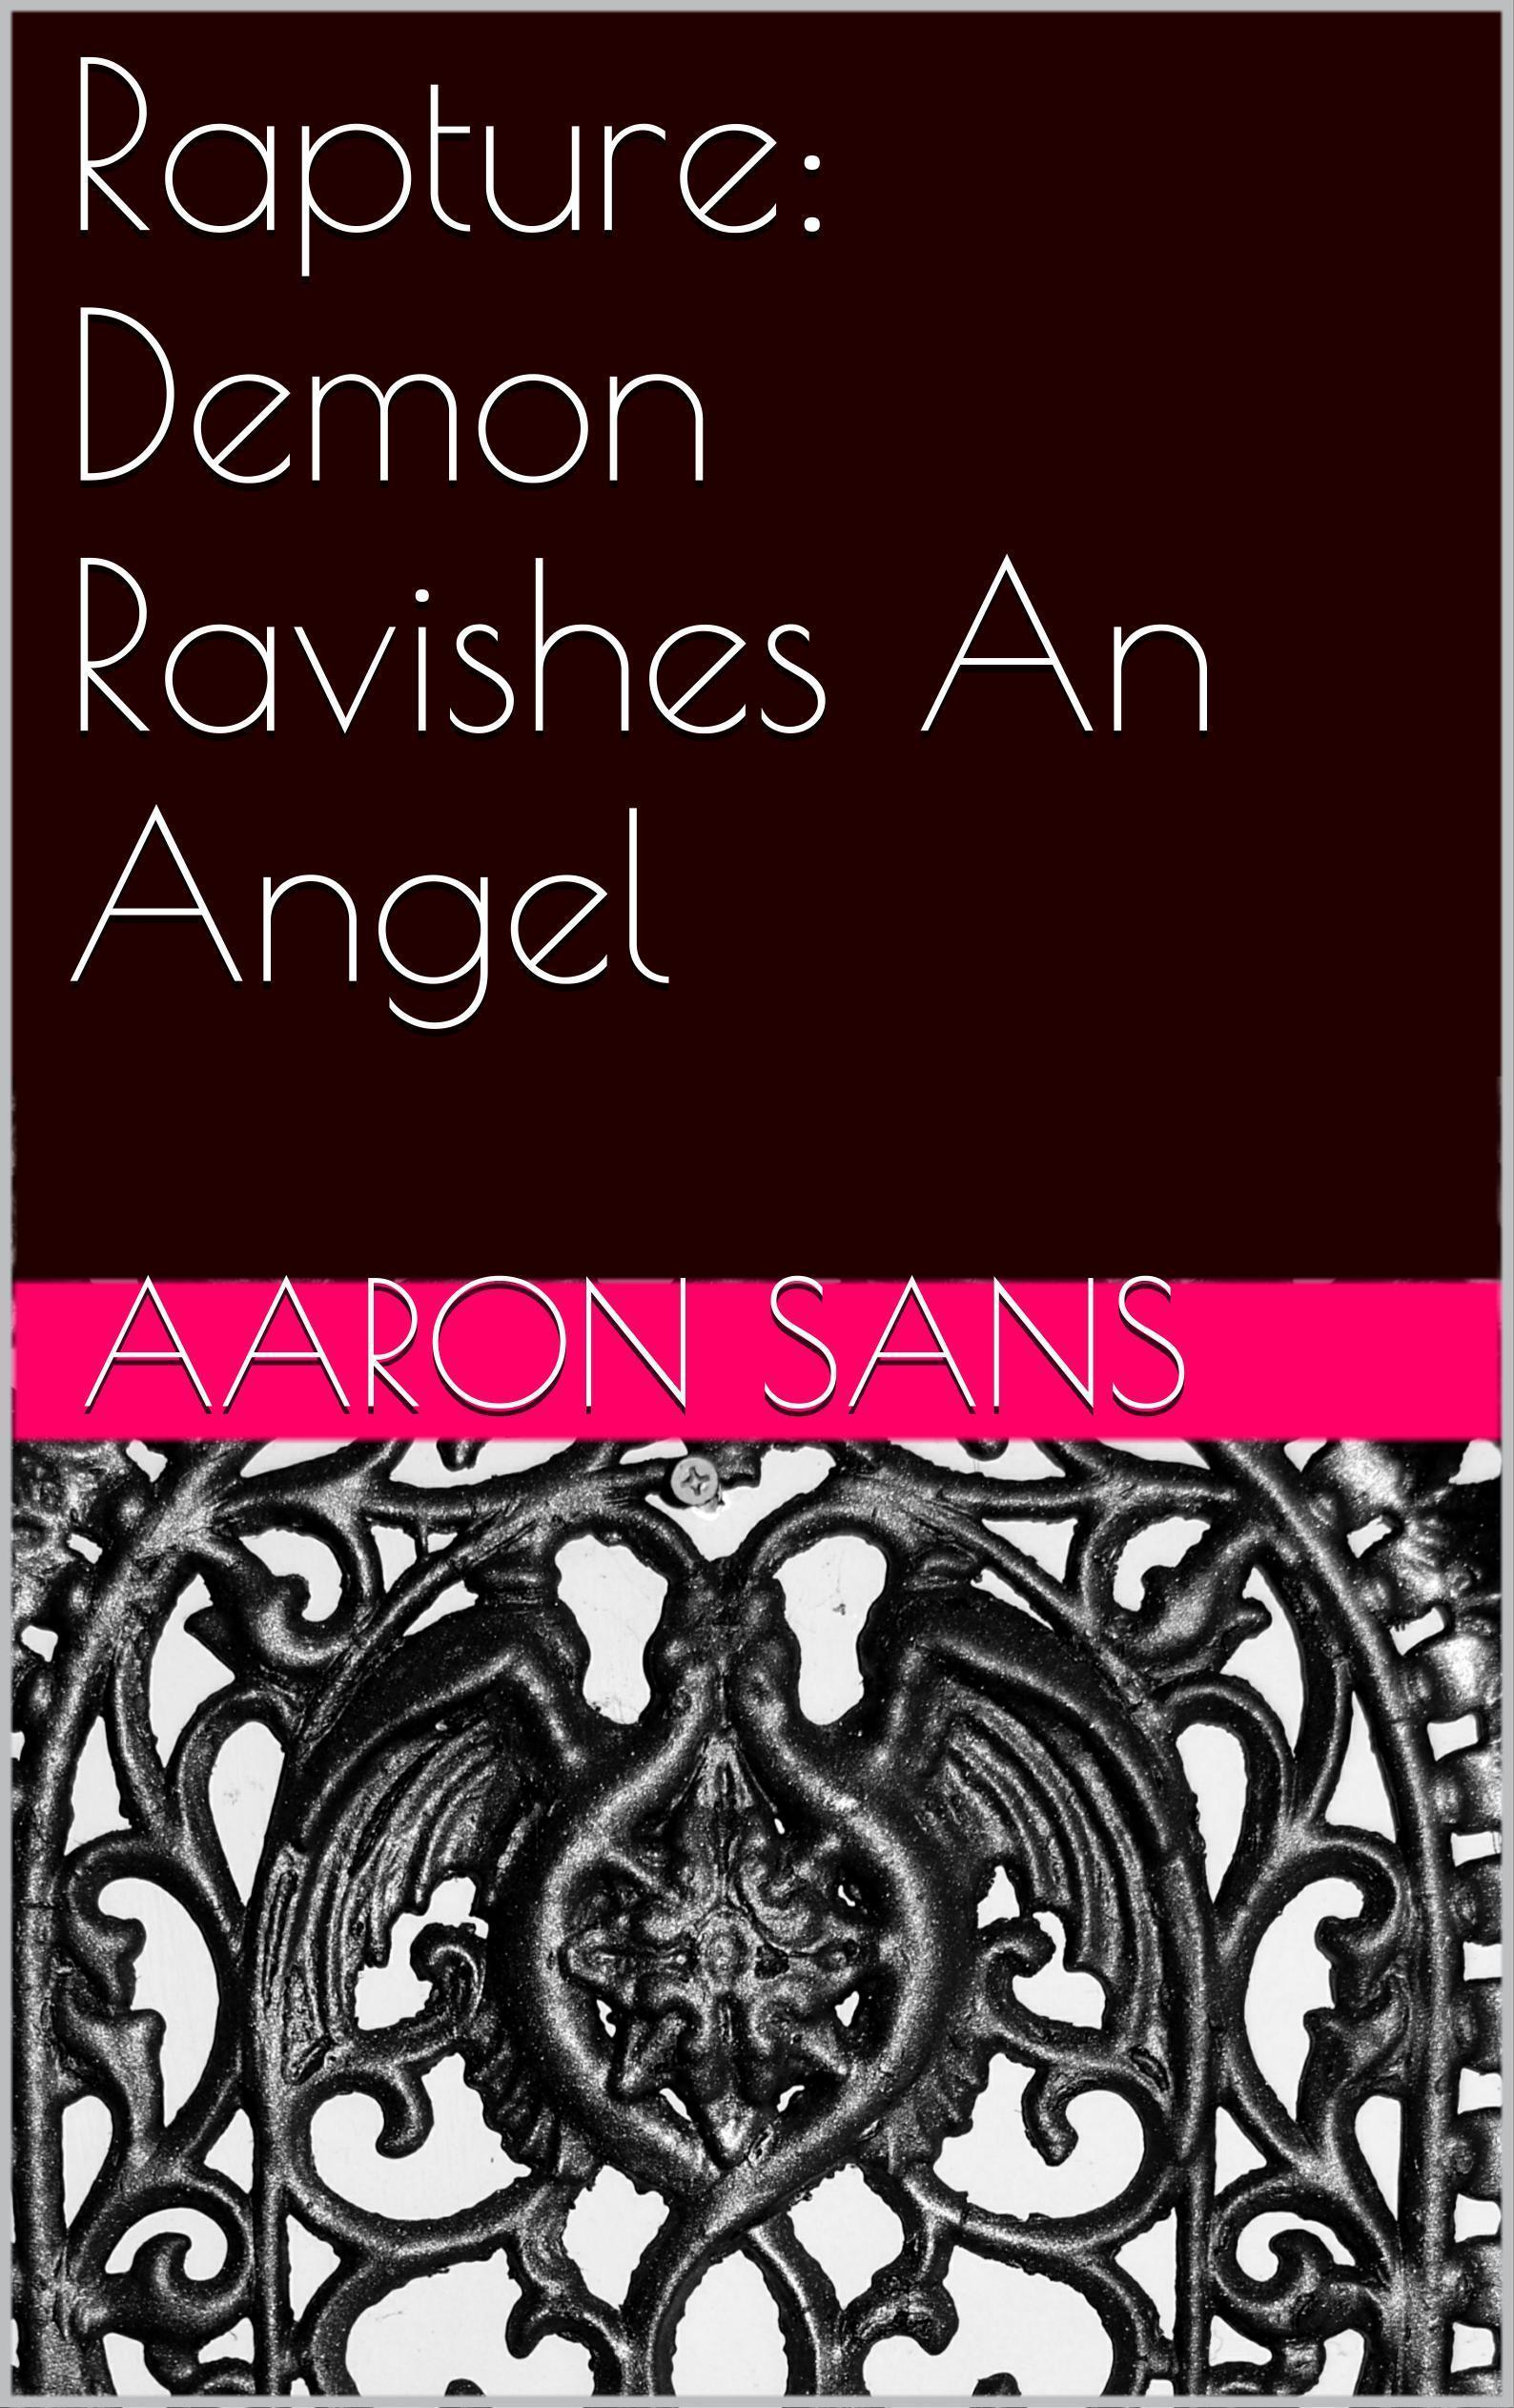 Rapture: Demon Ravishes An Angel Aaron Sans